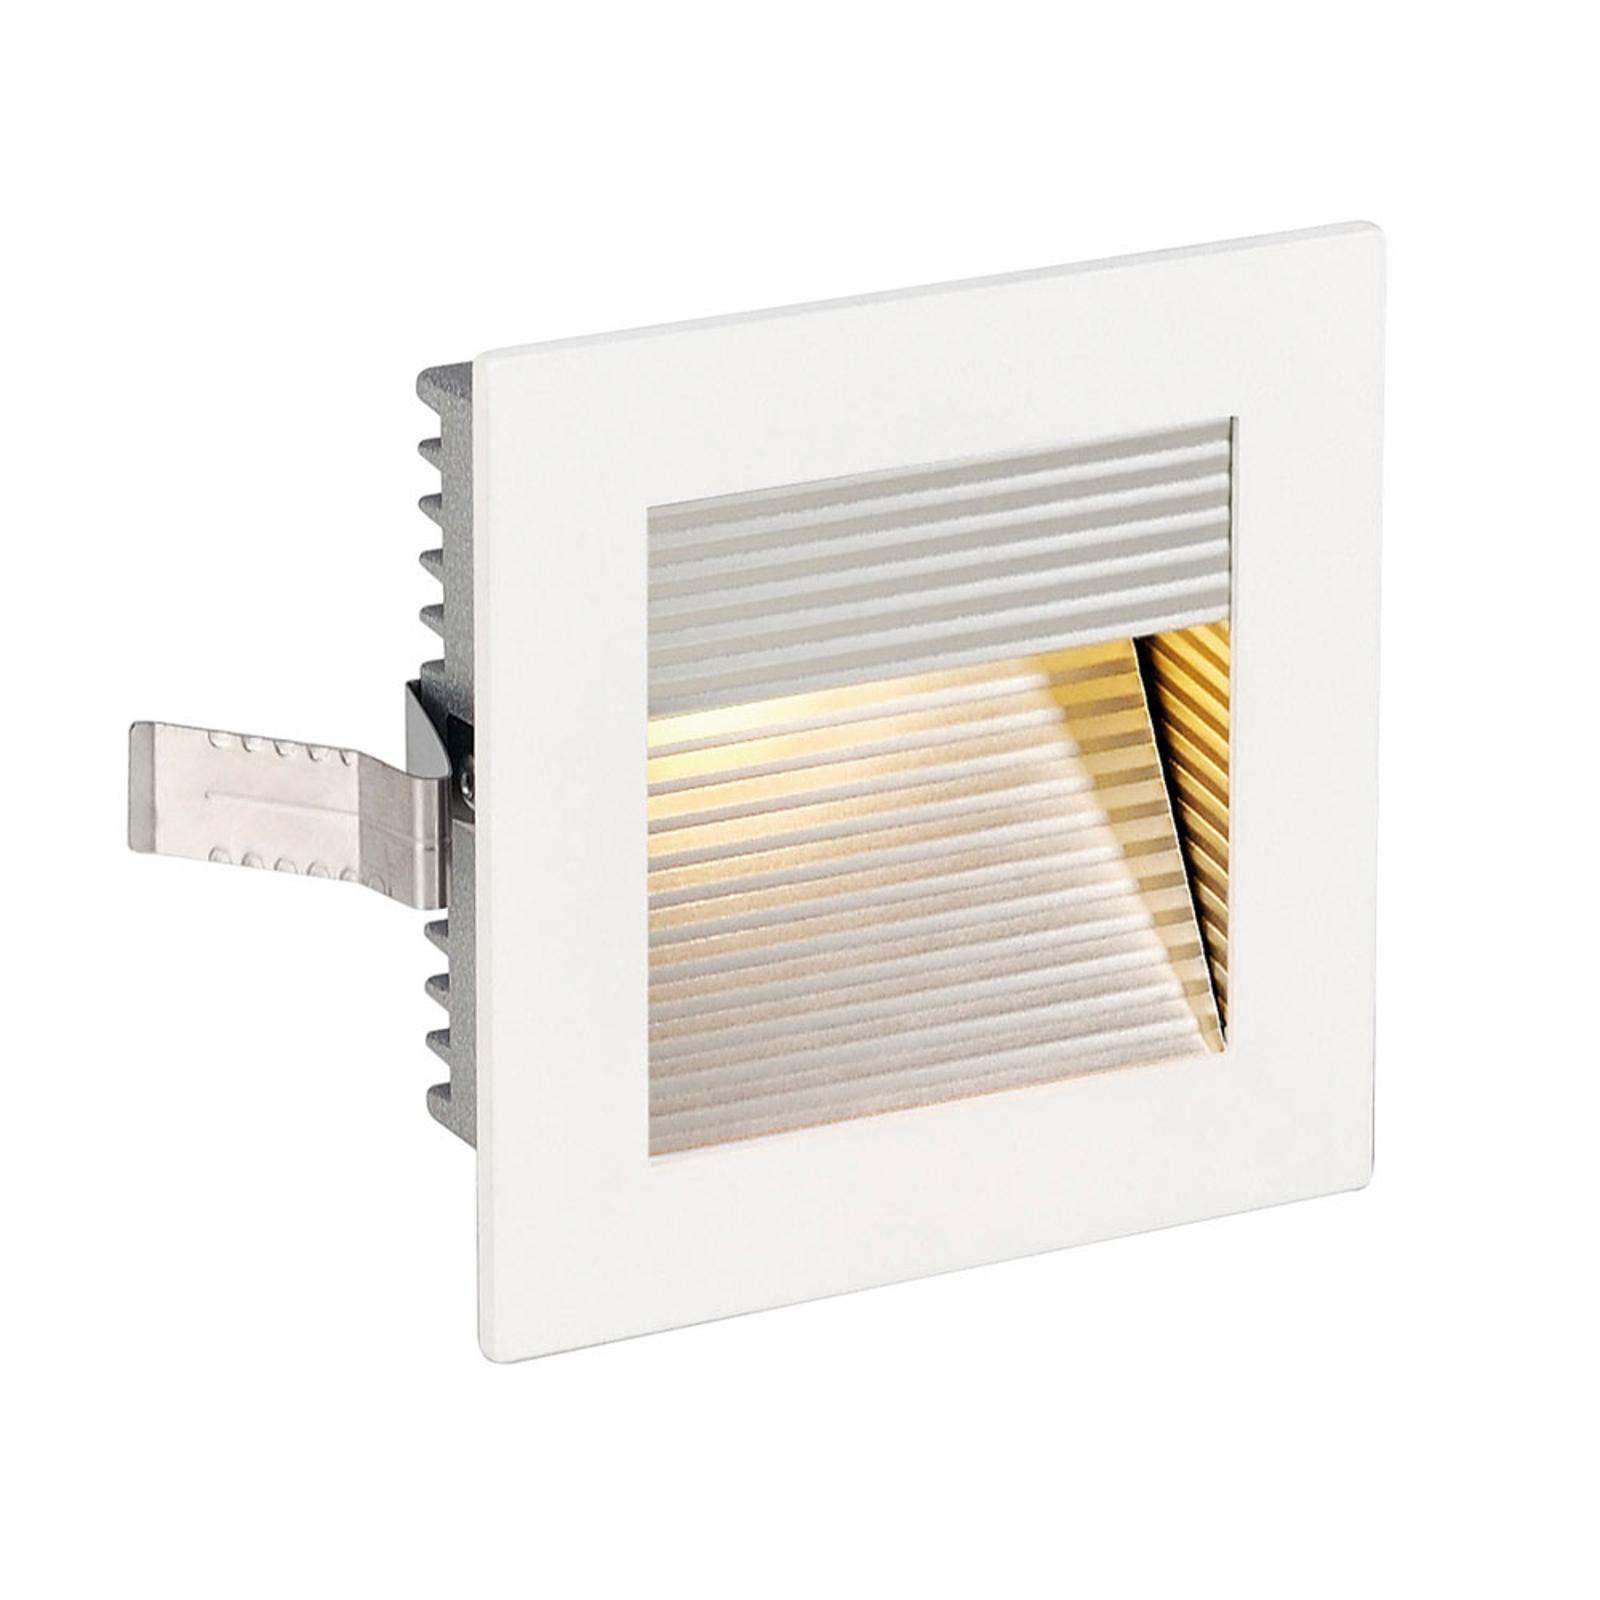 SLV lampa ścienna wpuszczana Flat Frame QT9 biała